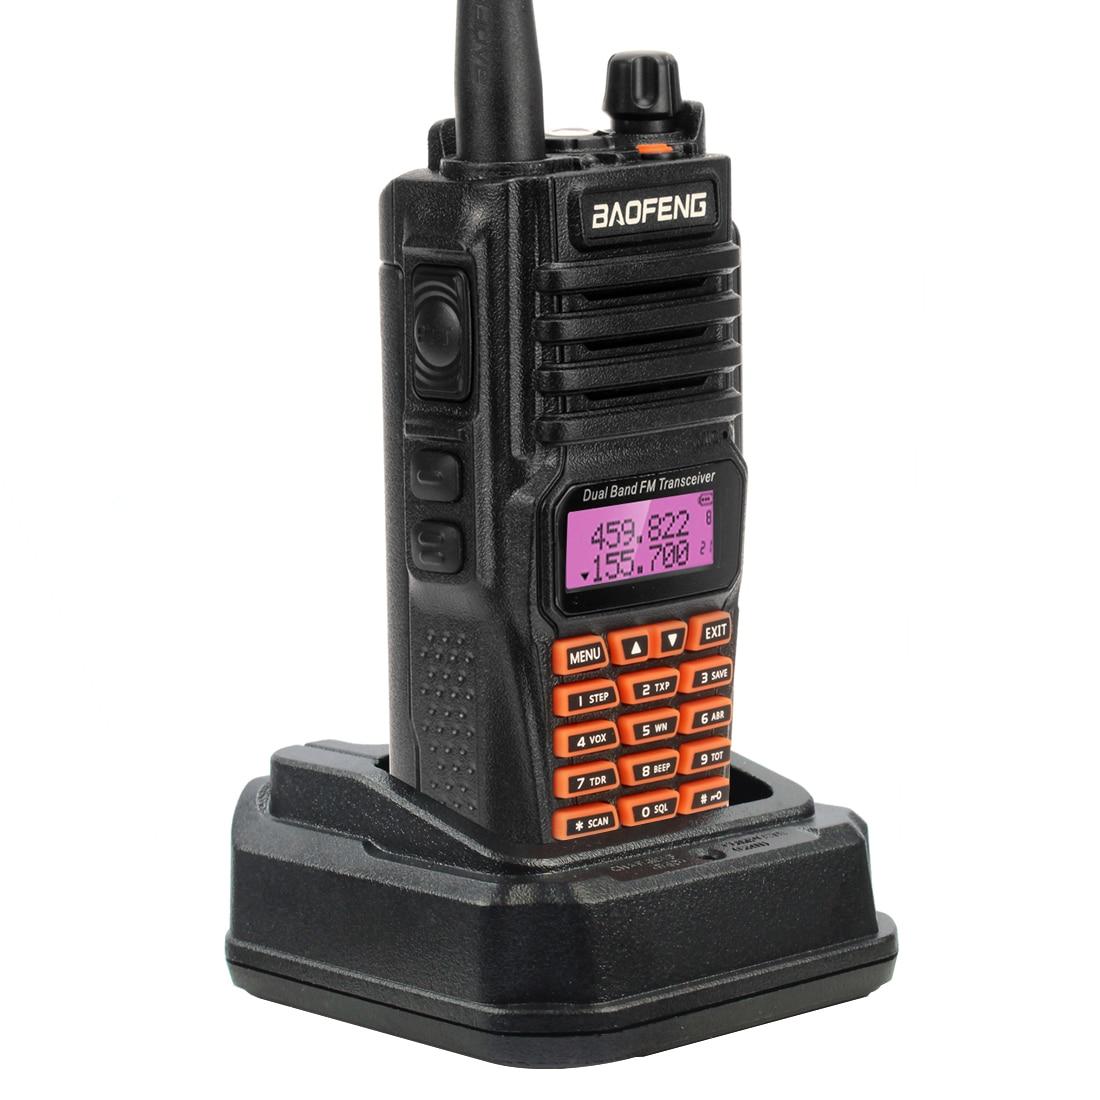 Baofeng UV-9R Waterproof Walkie Talkie IP67 5W Two Way Radio Station UHF VHF Outdoor Dual Band Walkie-talkie